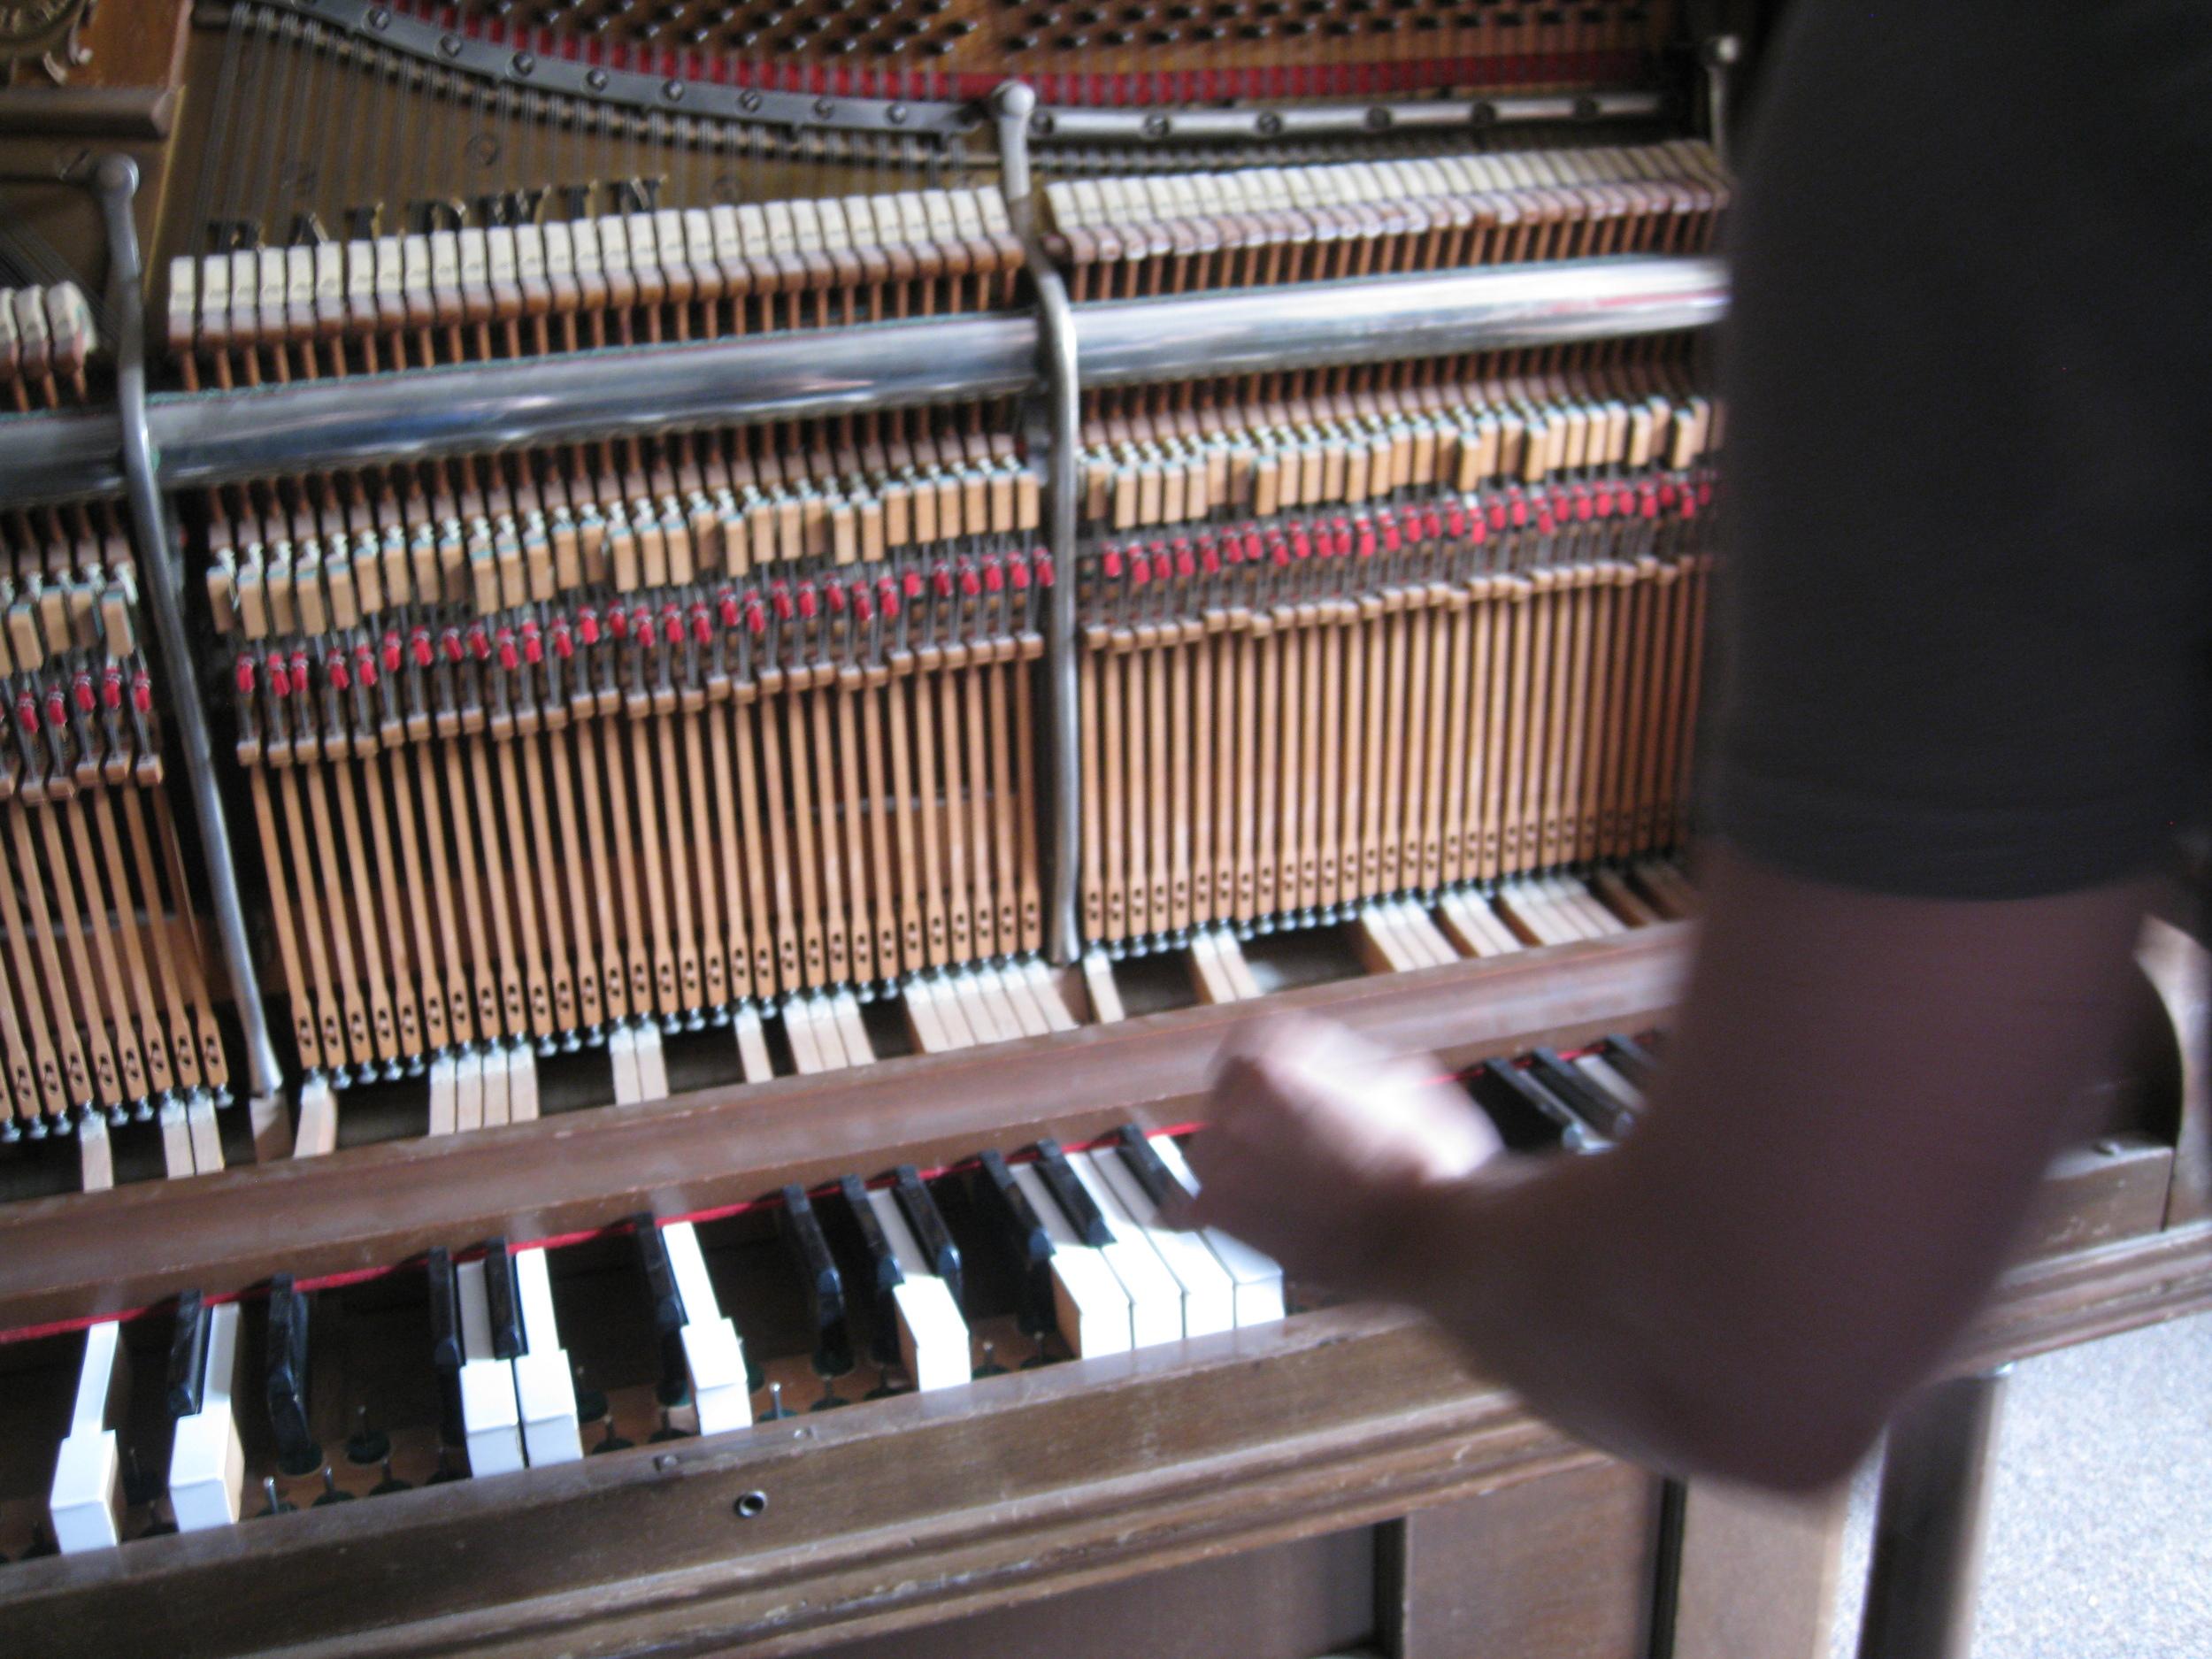 tina-guo-paul-spaeth-redemption-piano-cello-23.JPG